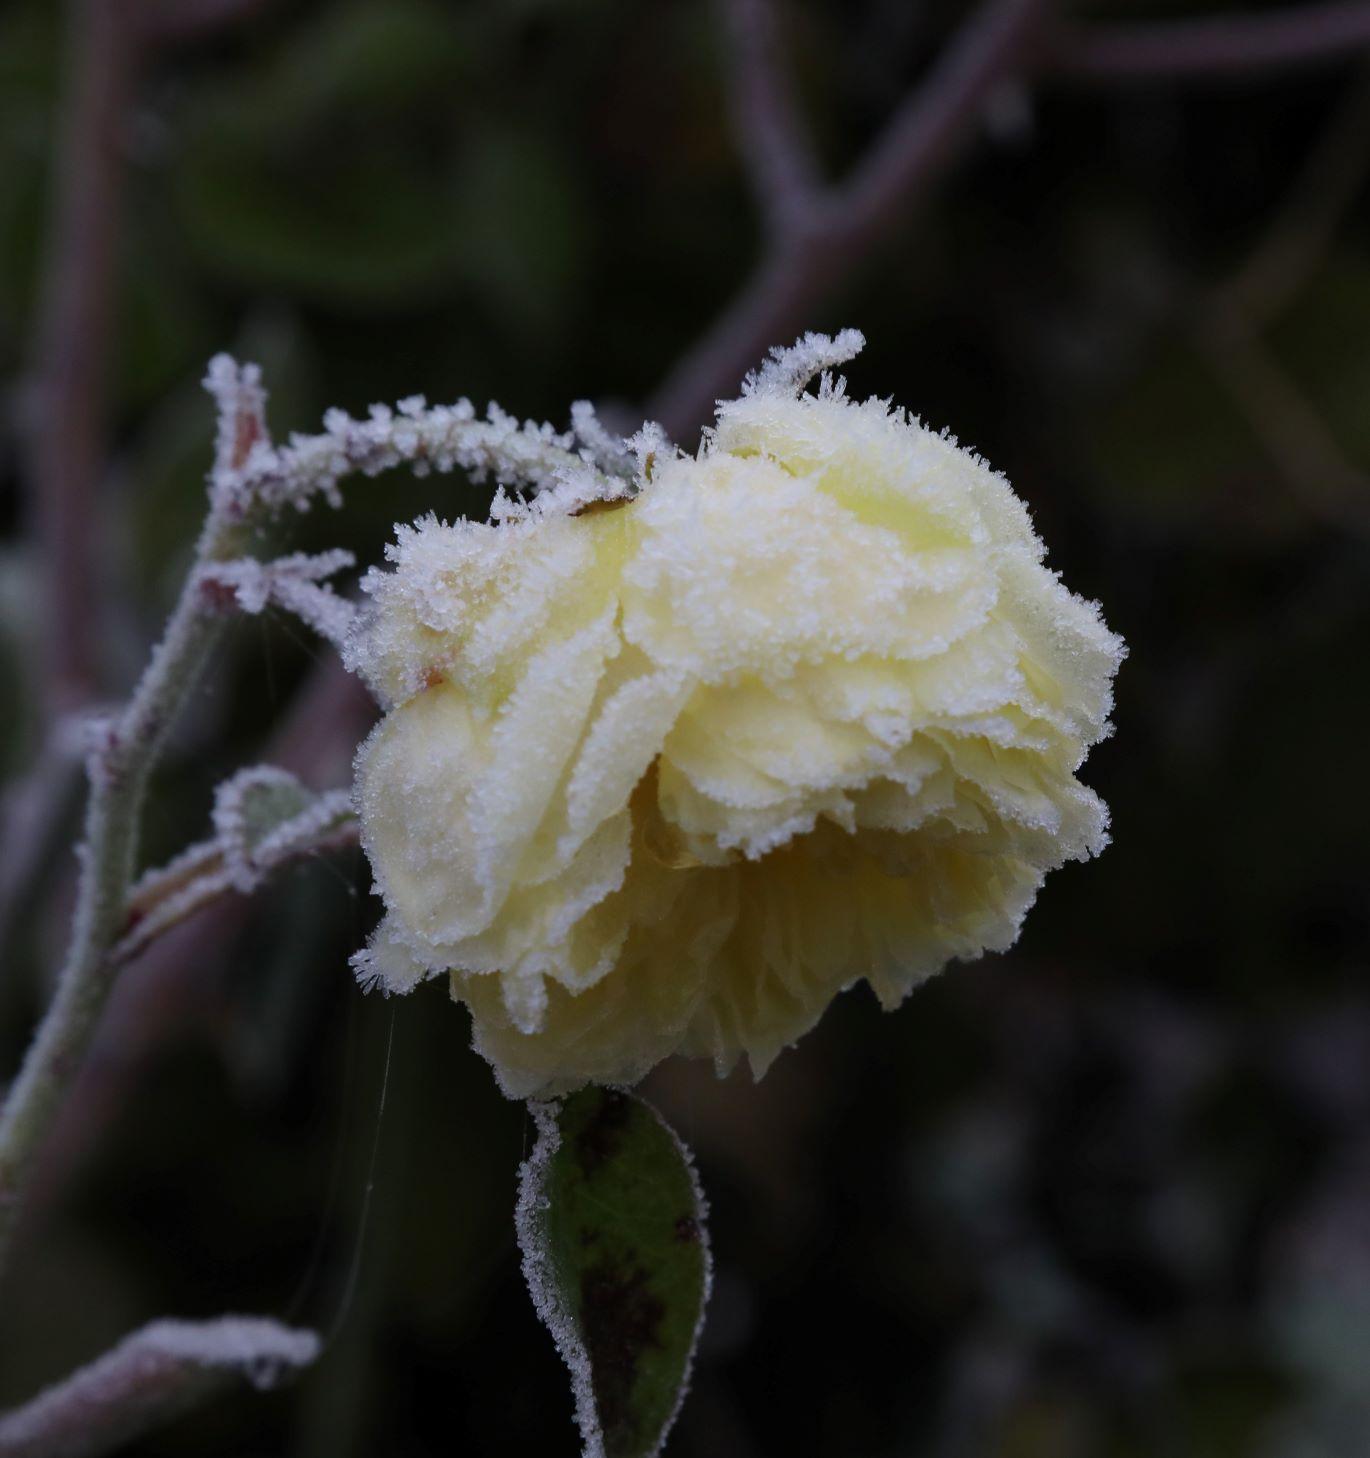 Rosalie-1 frost on rose